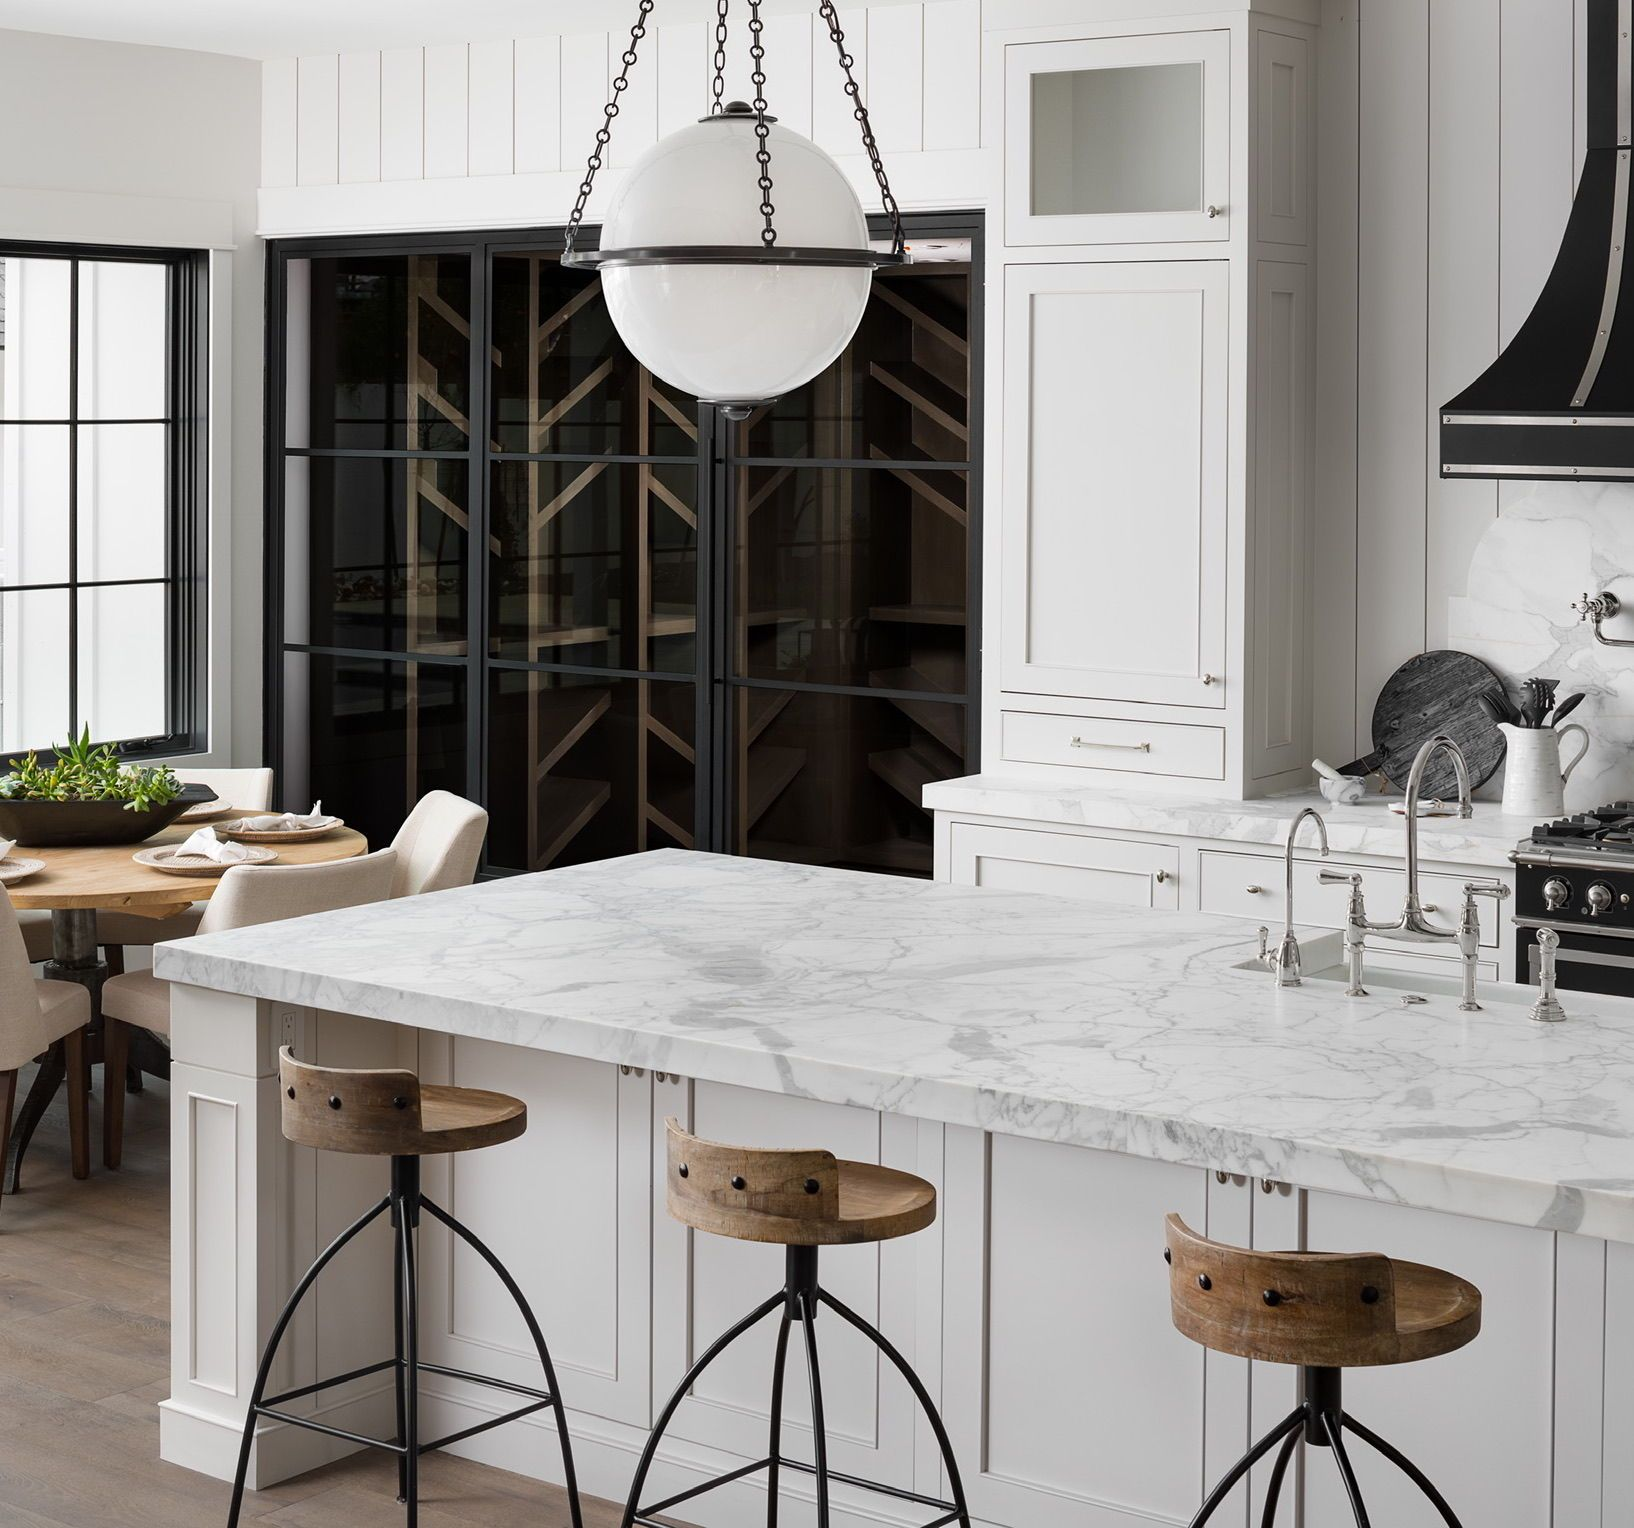 Meet The Luxury White Kitchen Of Your Dreams Stunning Shiplap Backsplash Meets A Walk In Win Luxury Kitchen Design Contemporary Bar Stools Kitchen Design Open